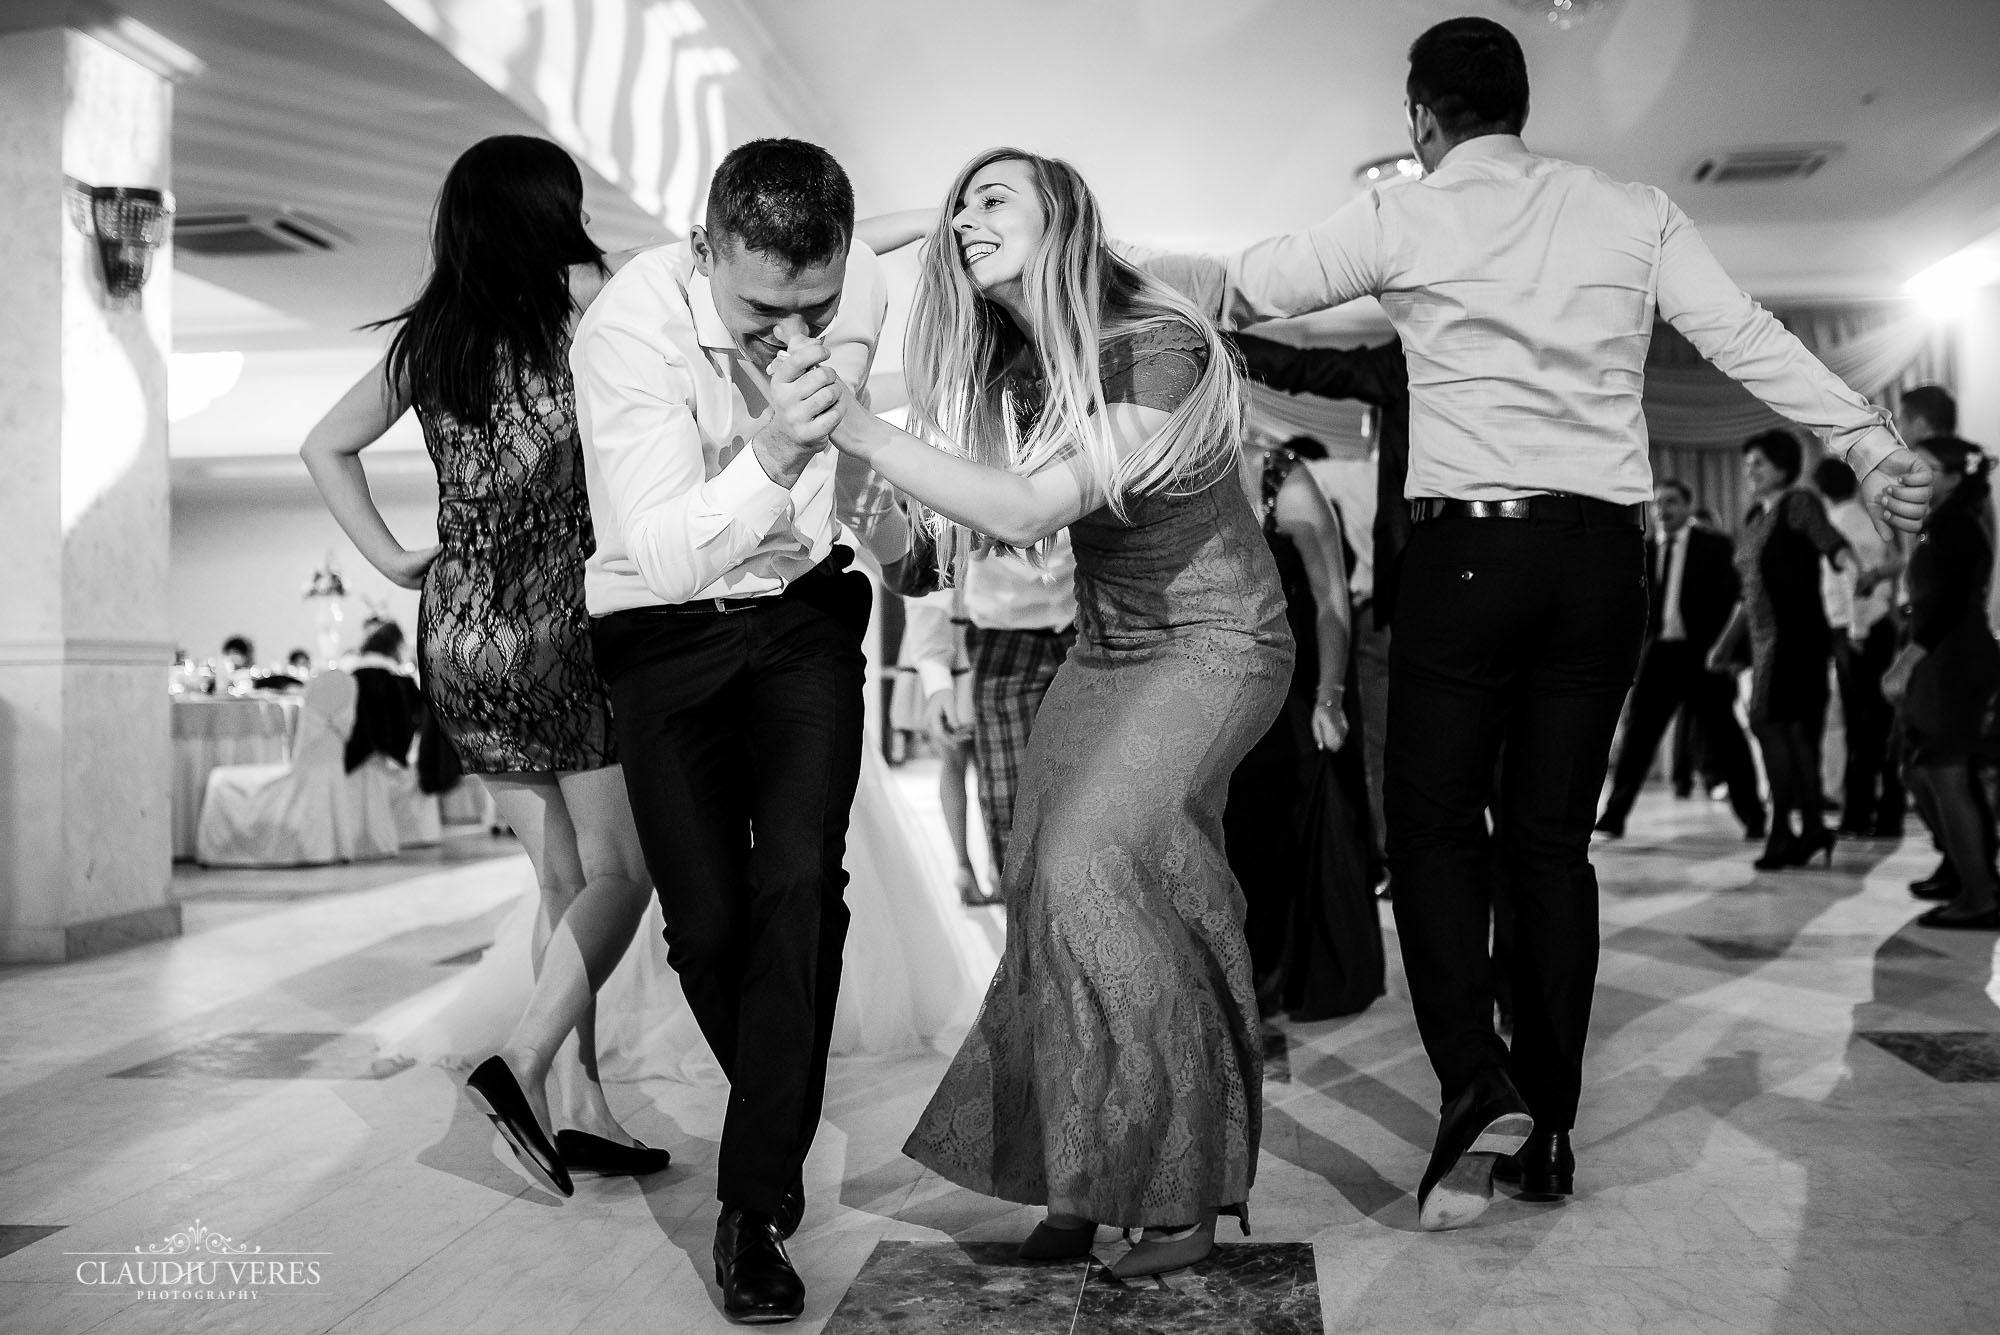 Fotograf iasi, fotograf nunta iasi, fotograf nunta bacau, fotograf bacau, fotograf nunta piatra neamt, fotograf suceava, fotograf profesionist bacau, fotograf piatra neamt, foto video iasi, fotograf onesti, foto video piatra neamt, filmari bacau, foto video bacau, fotograf nunta suceava, fotograf piatra neamt, sedinta foto palatul cuza de la ruginoasa, trash the dress iasi, nunta piatra neamt, nunta iasi